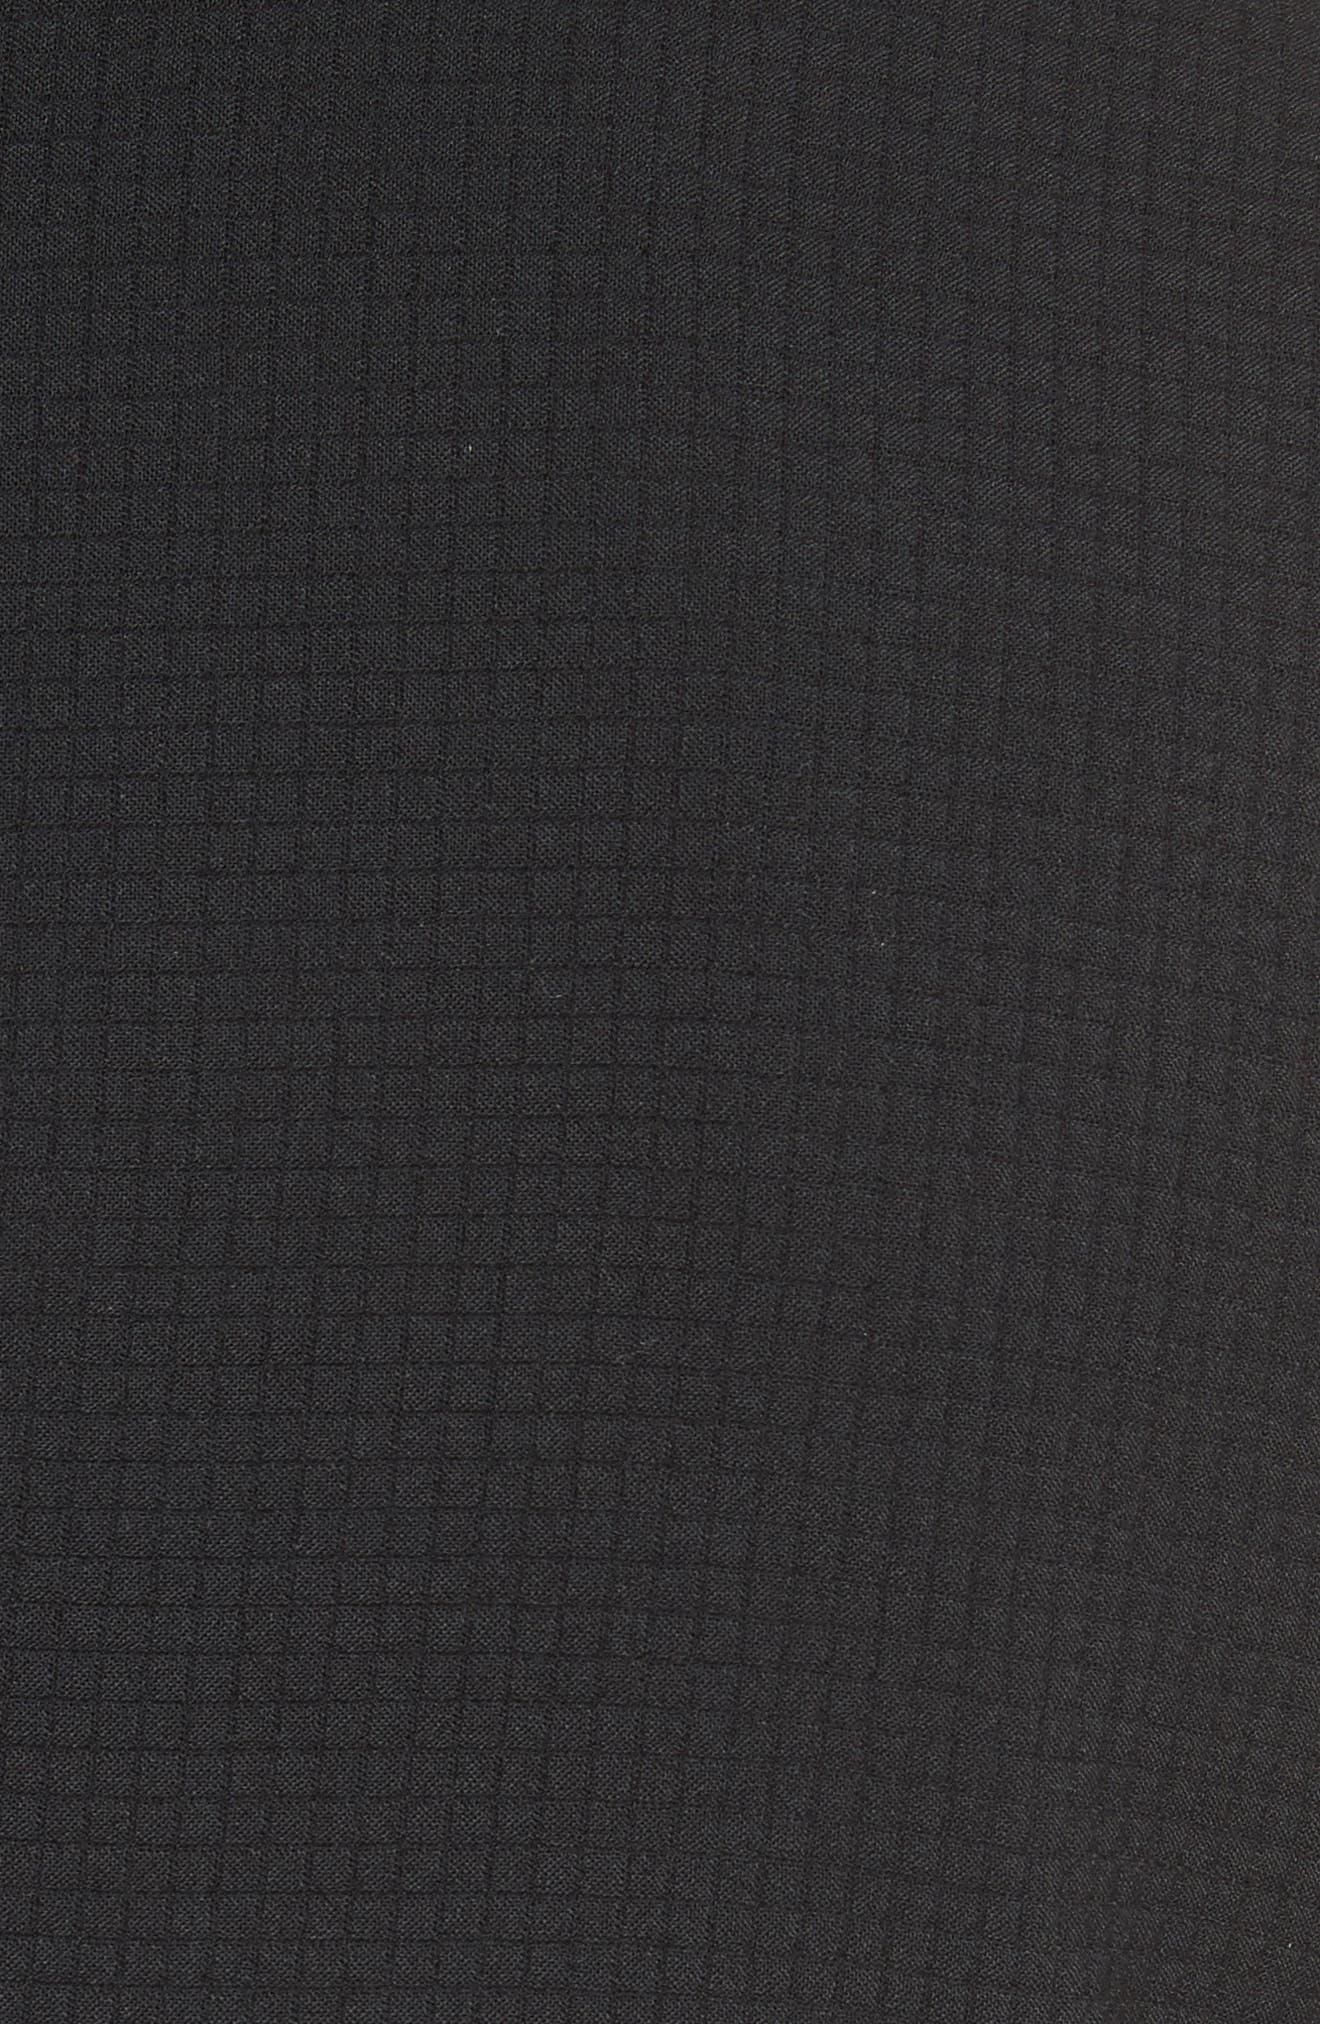 Ripstop Check Wool Blend Jacket,                             Alternate thumbnail 5, color,                             001